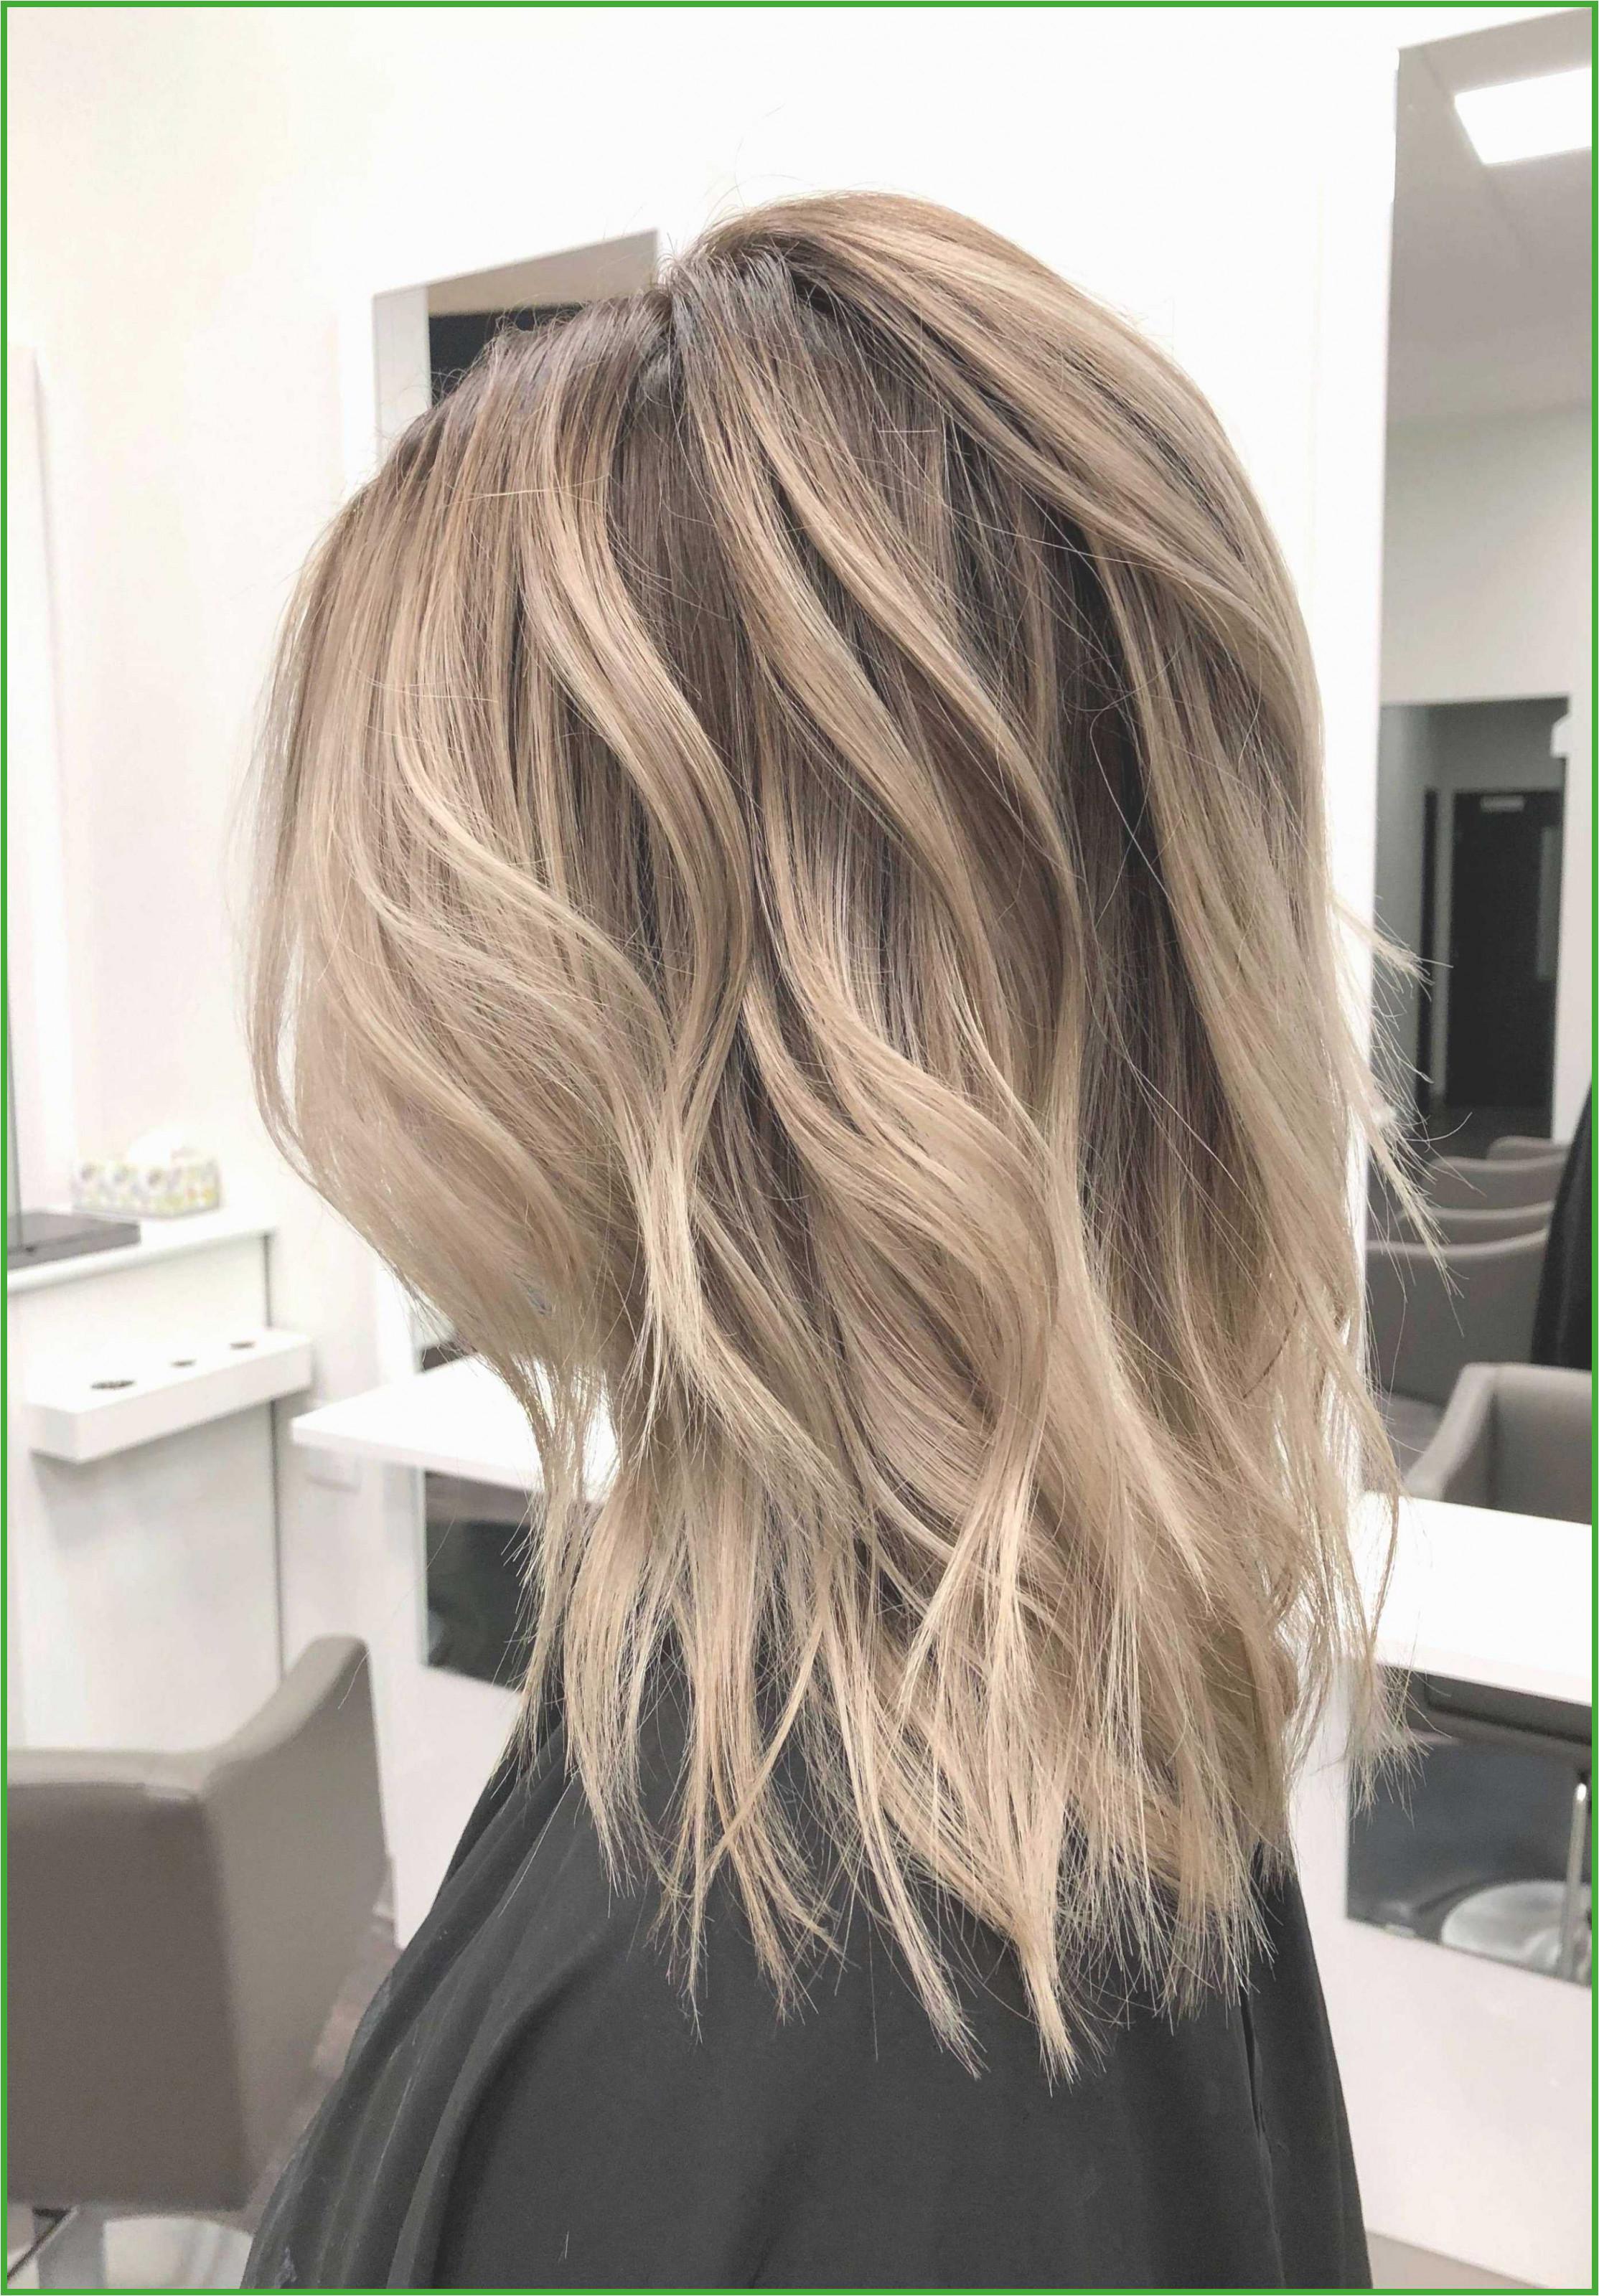 Hair Up Hairstyles for Thin Hair top 20 Layered Haircuts for Thin Hair